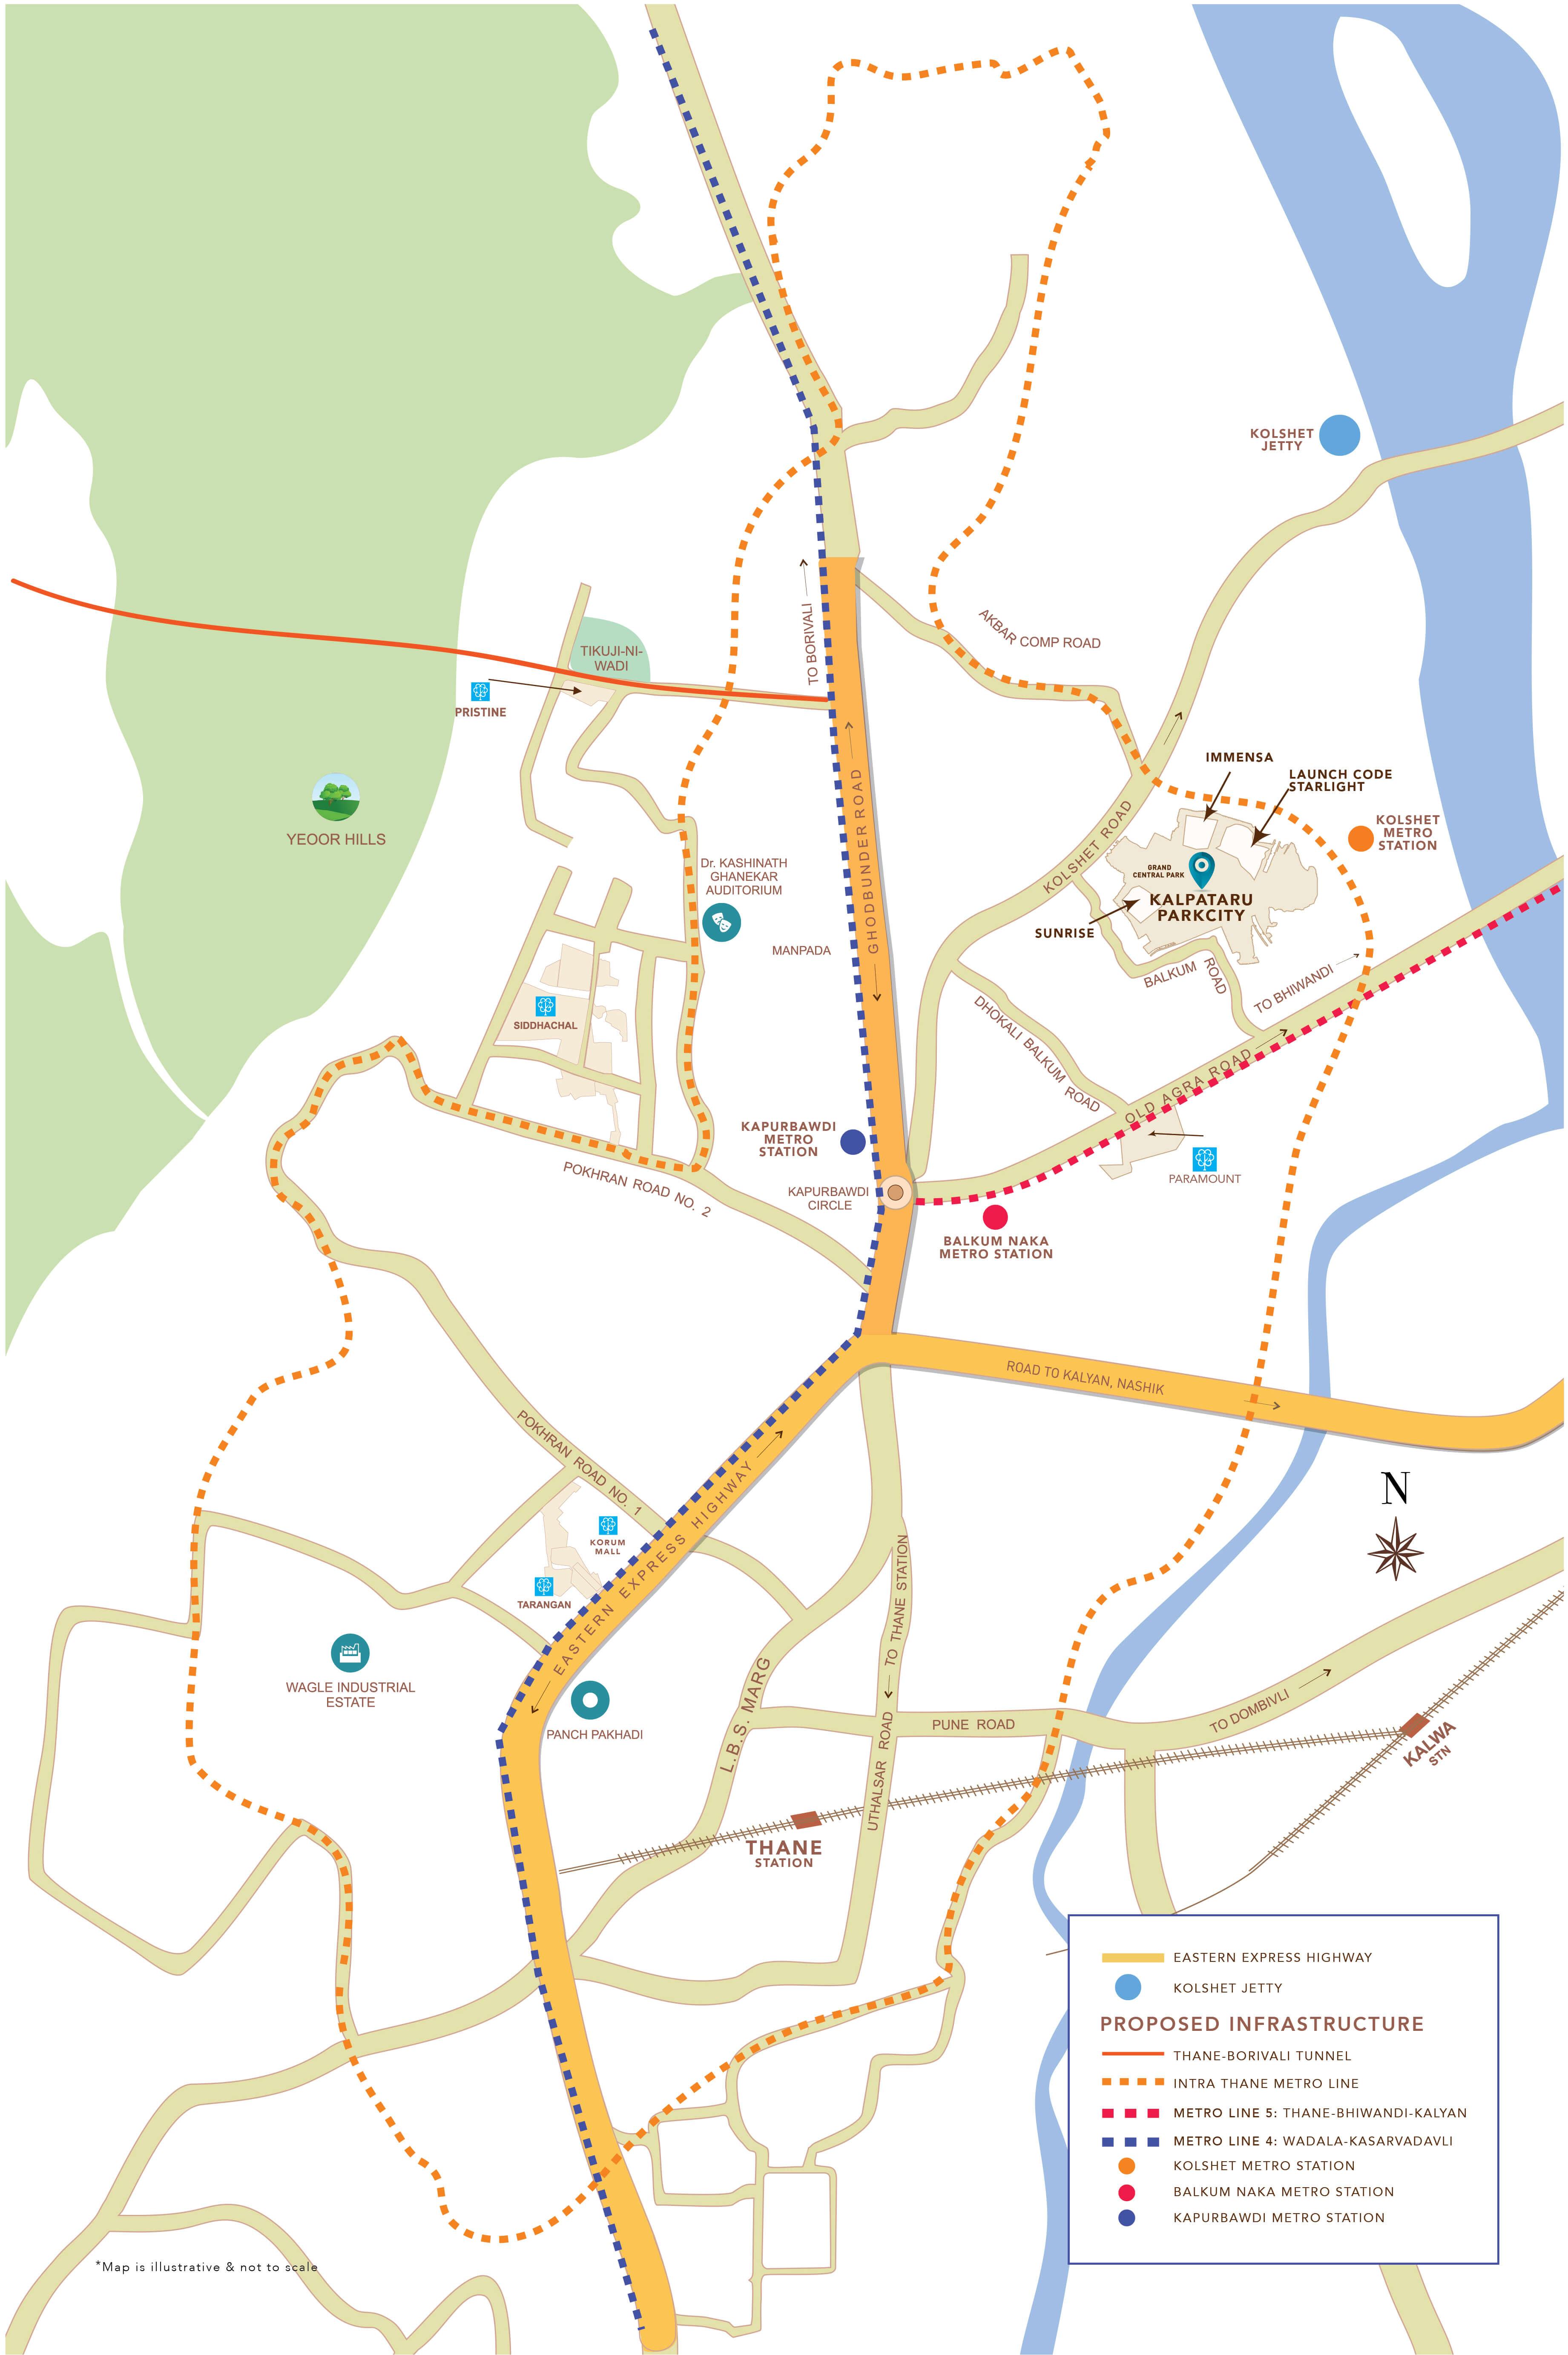 kalpataru parkcity sunrise c location image4